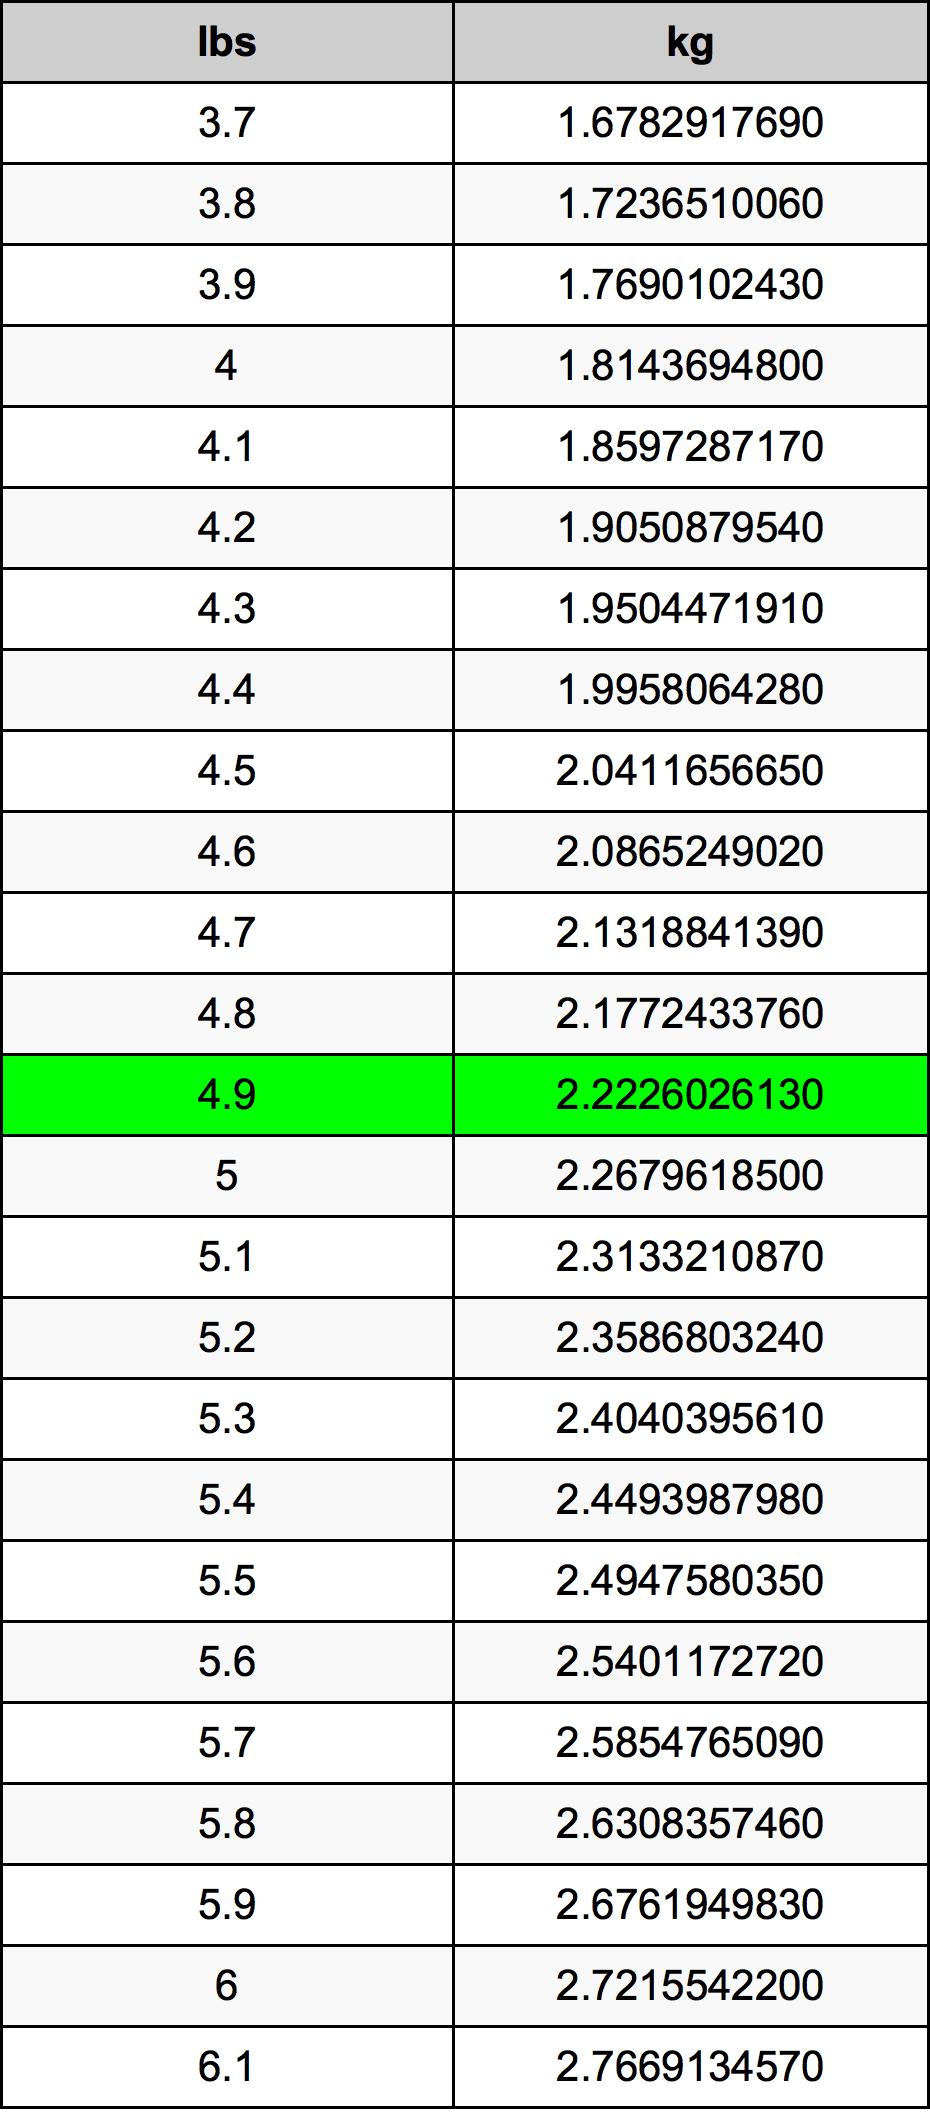 4.9 Pon konversi tabel